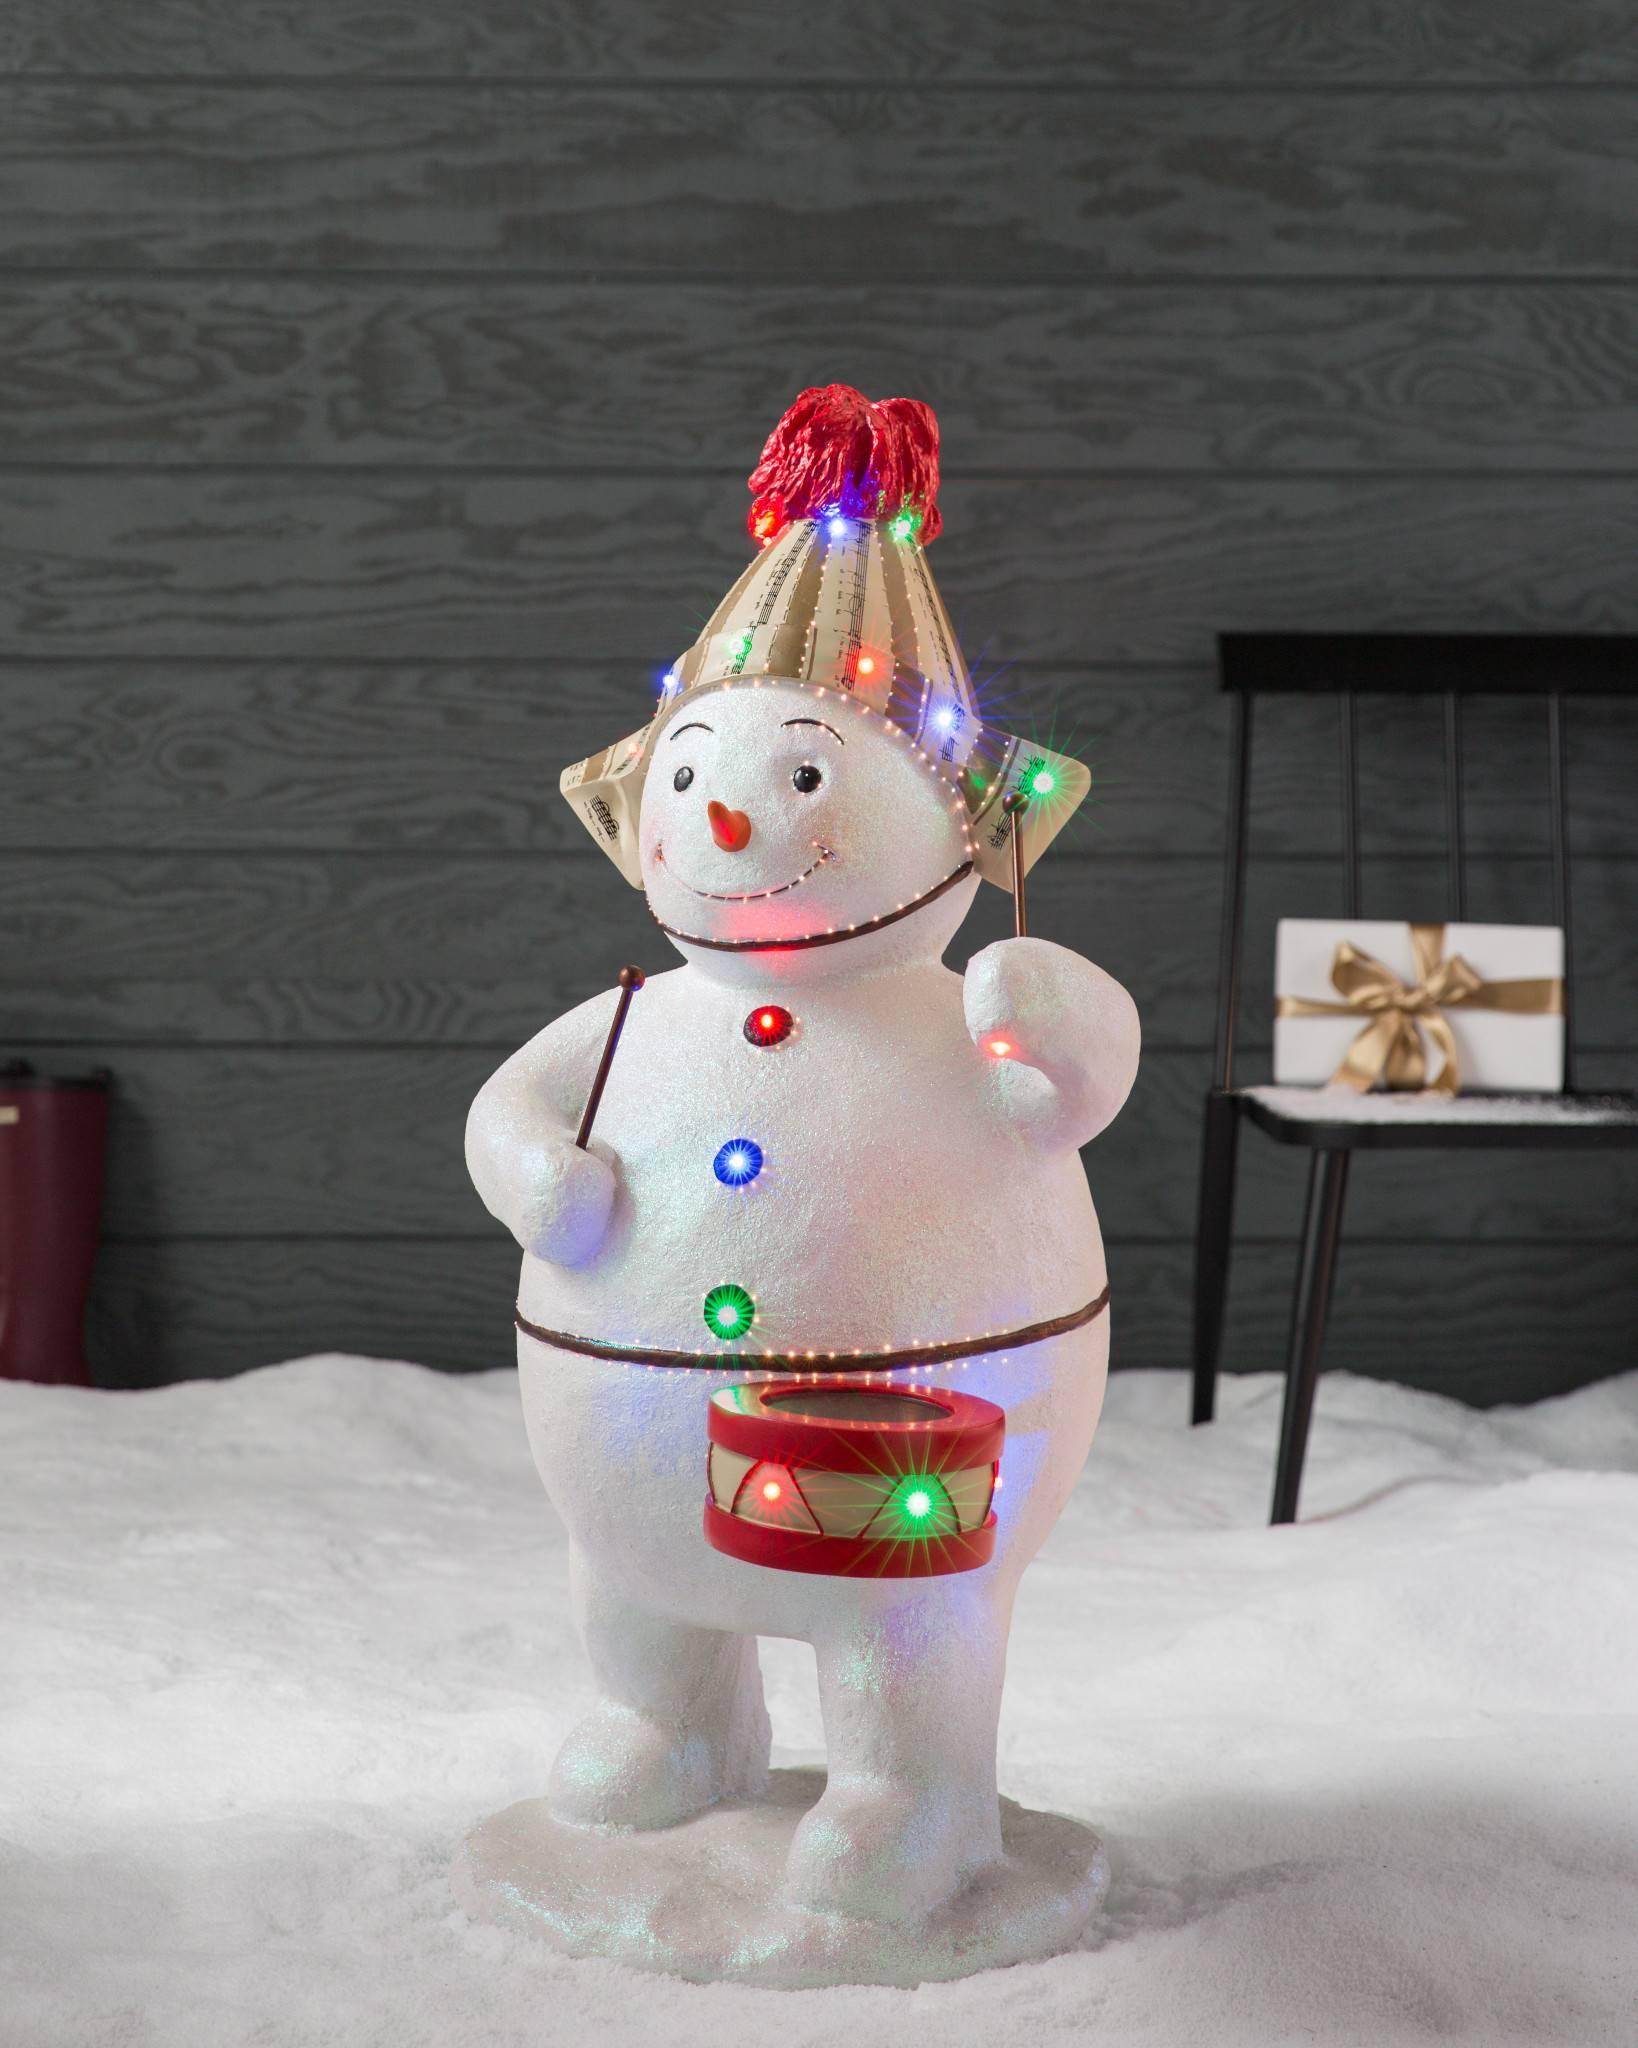 Outdoor Snowman Lights Outdoor fiber optic snowman band balsam hill outdoor fiber optic snowman with drum by balsam hill workwithnaturefo